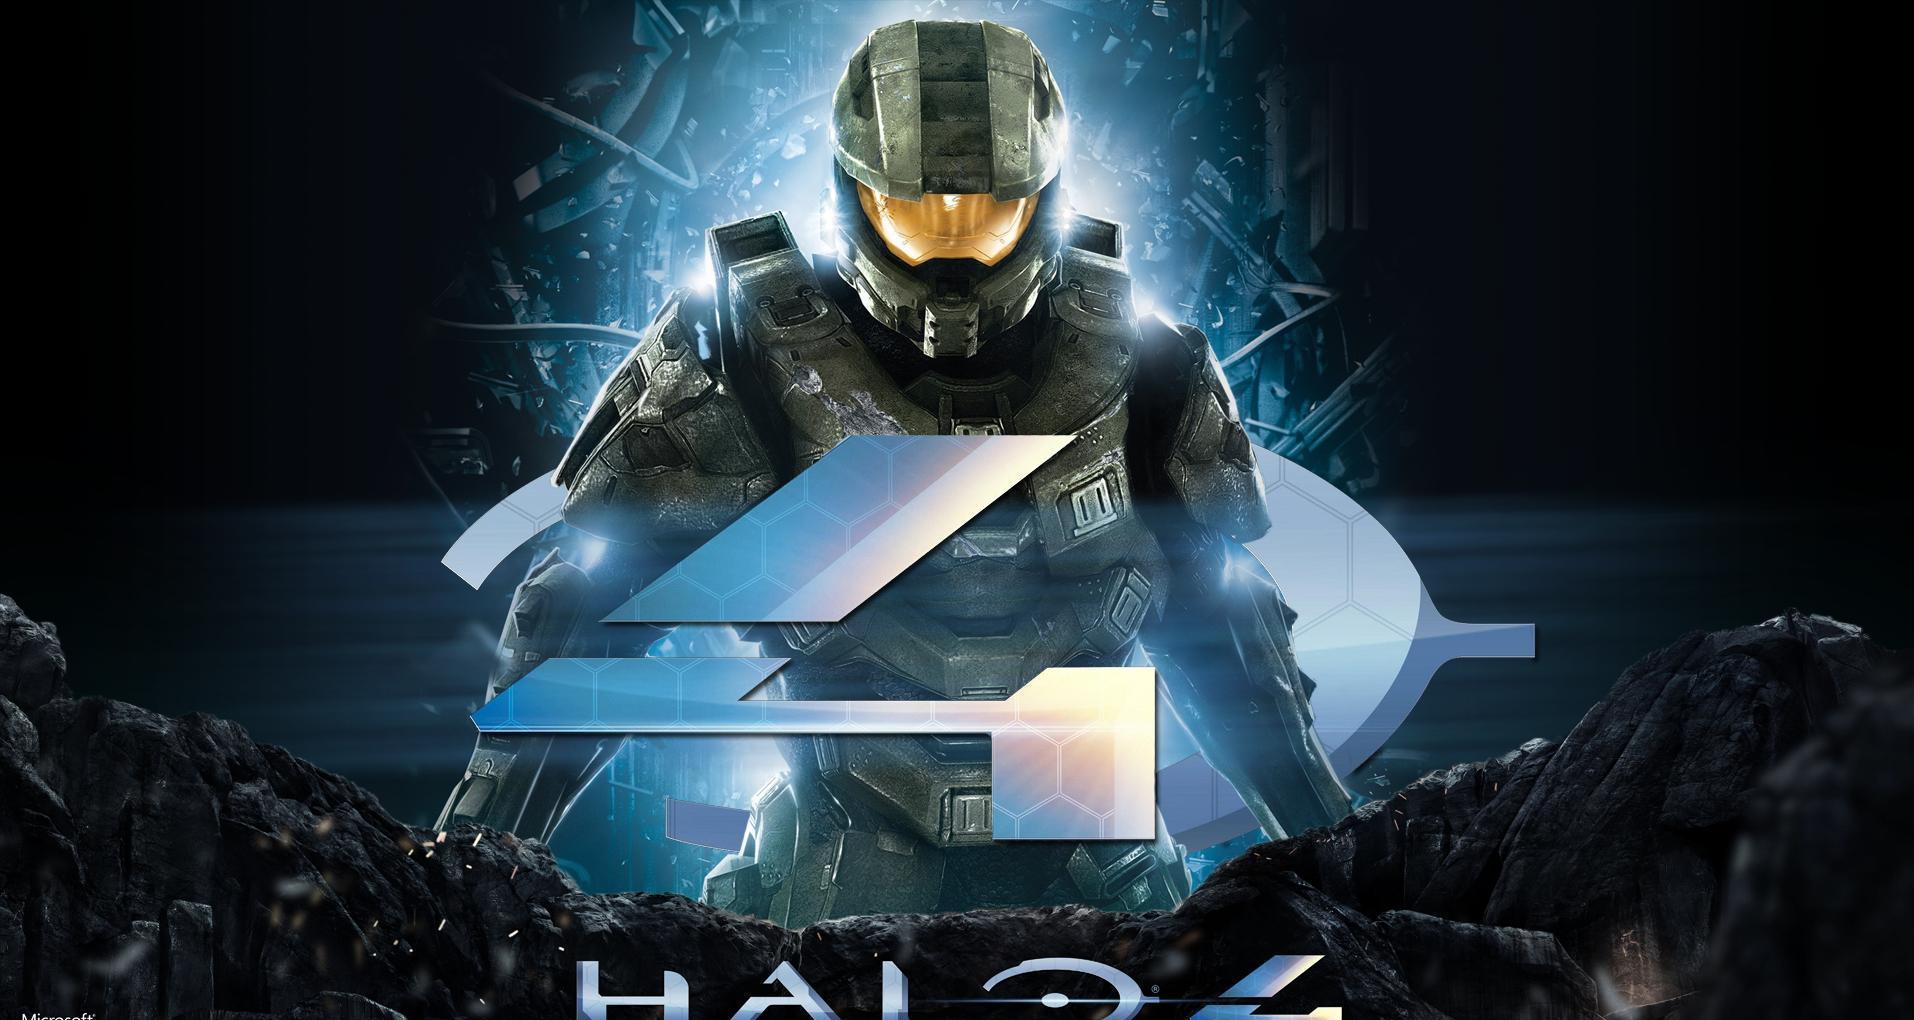 Halo 4 Wallpaper HD Download 1914x1020